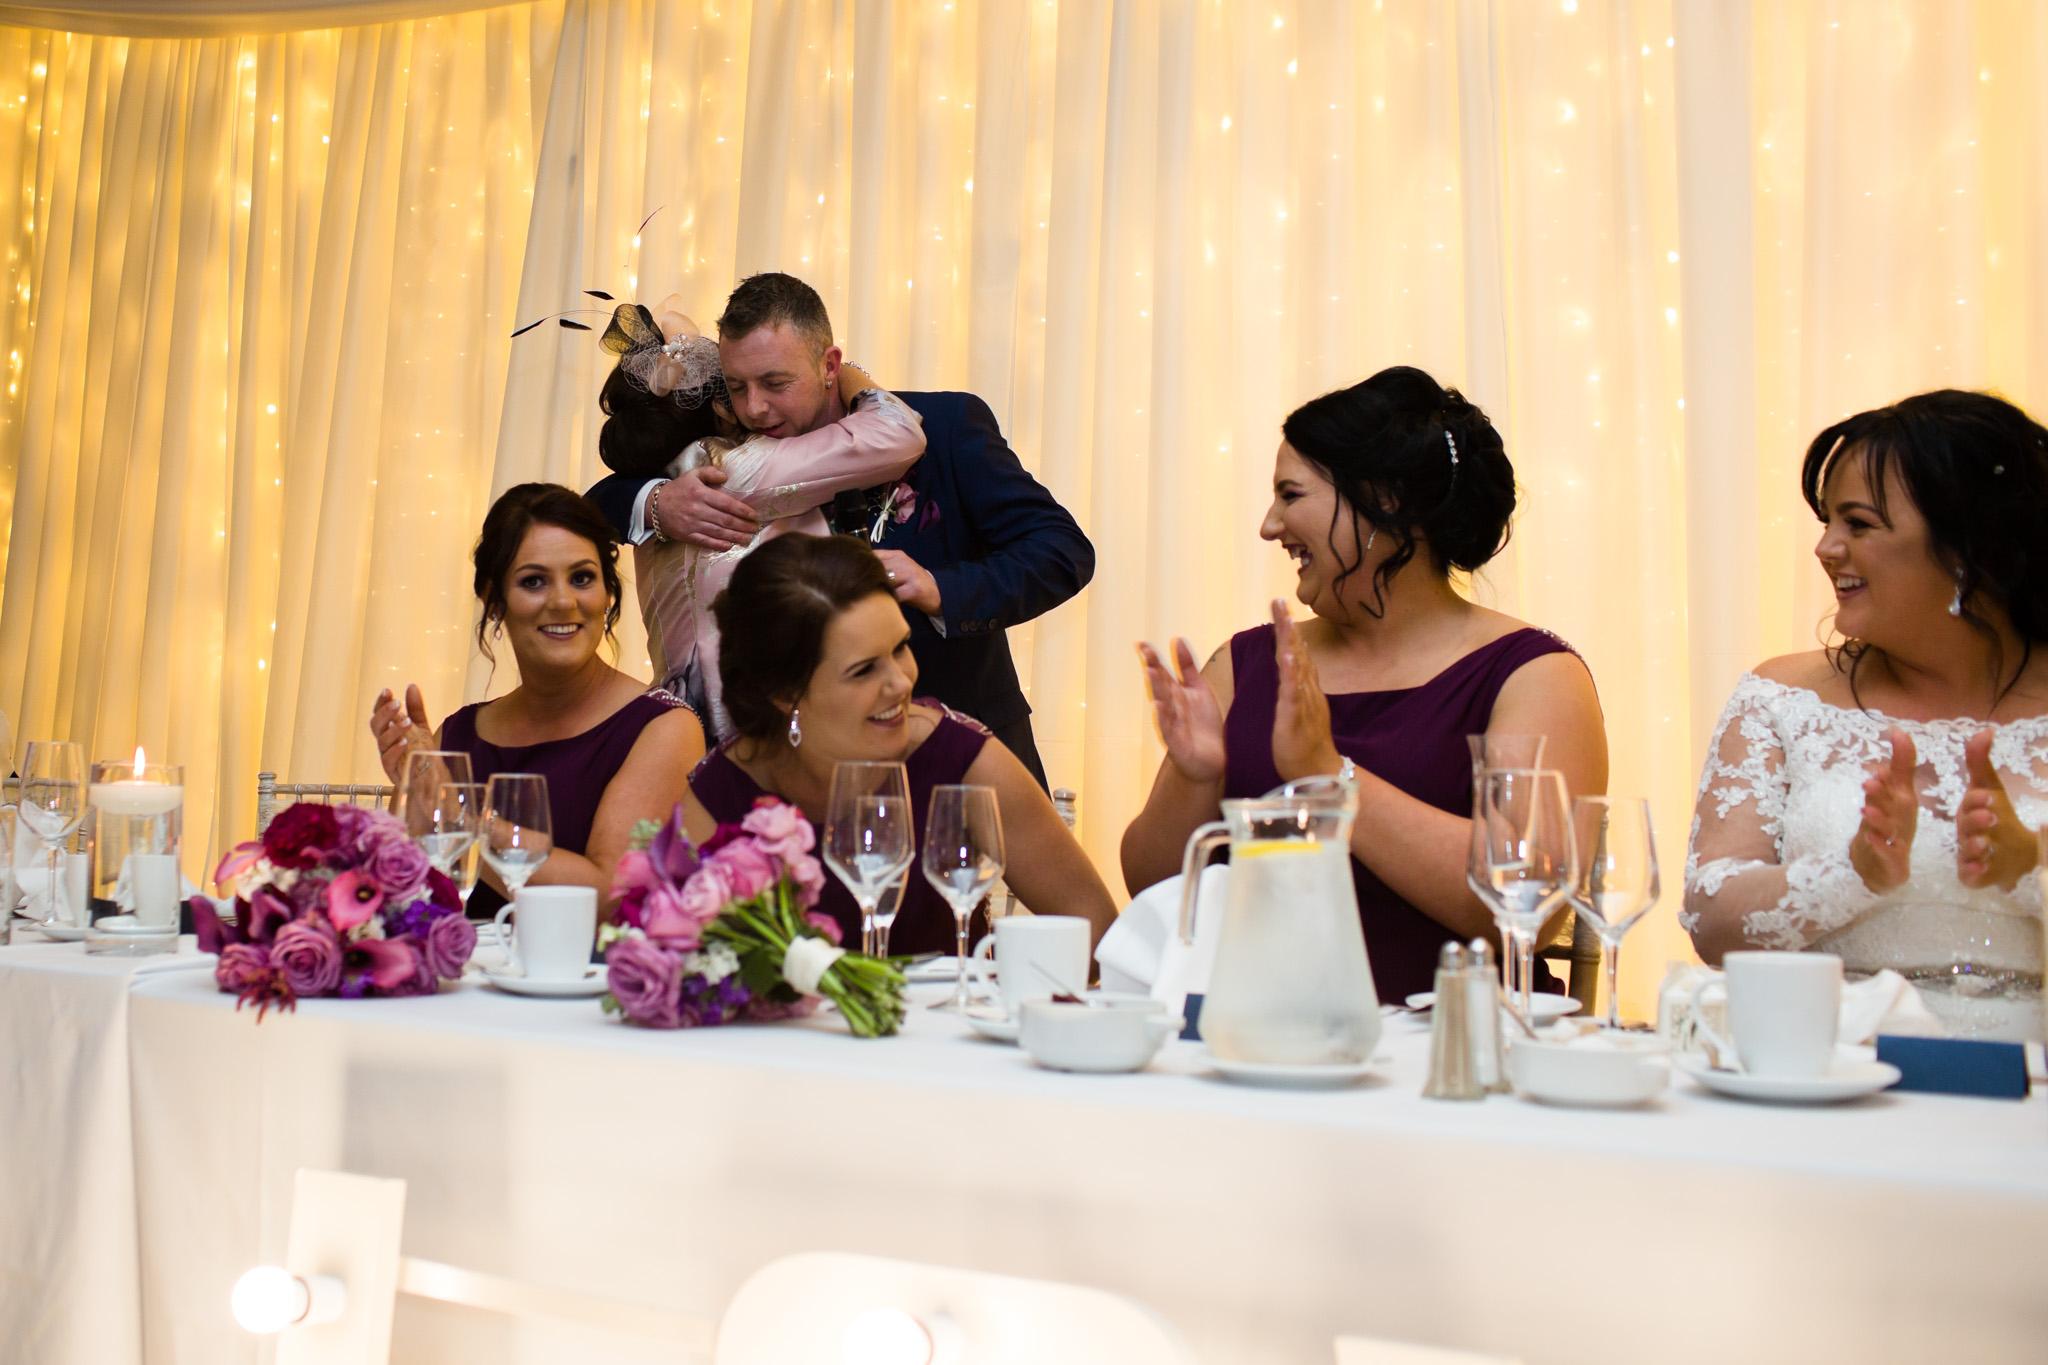 Mark_Barnes_Northern_Ireland_Wedding_Photography_Marine_hotel_ballycastle_Wedding_Photography_Janet&Darren-36.jpg